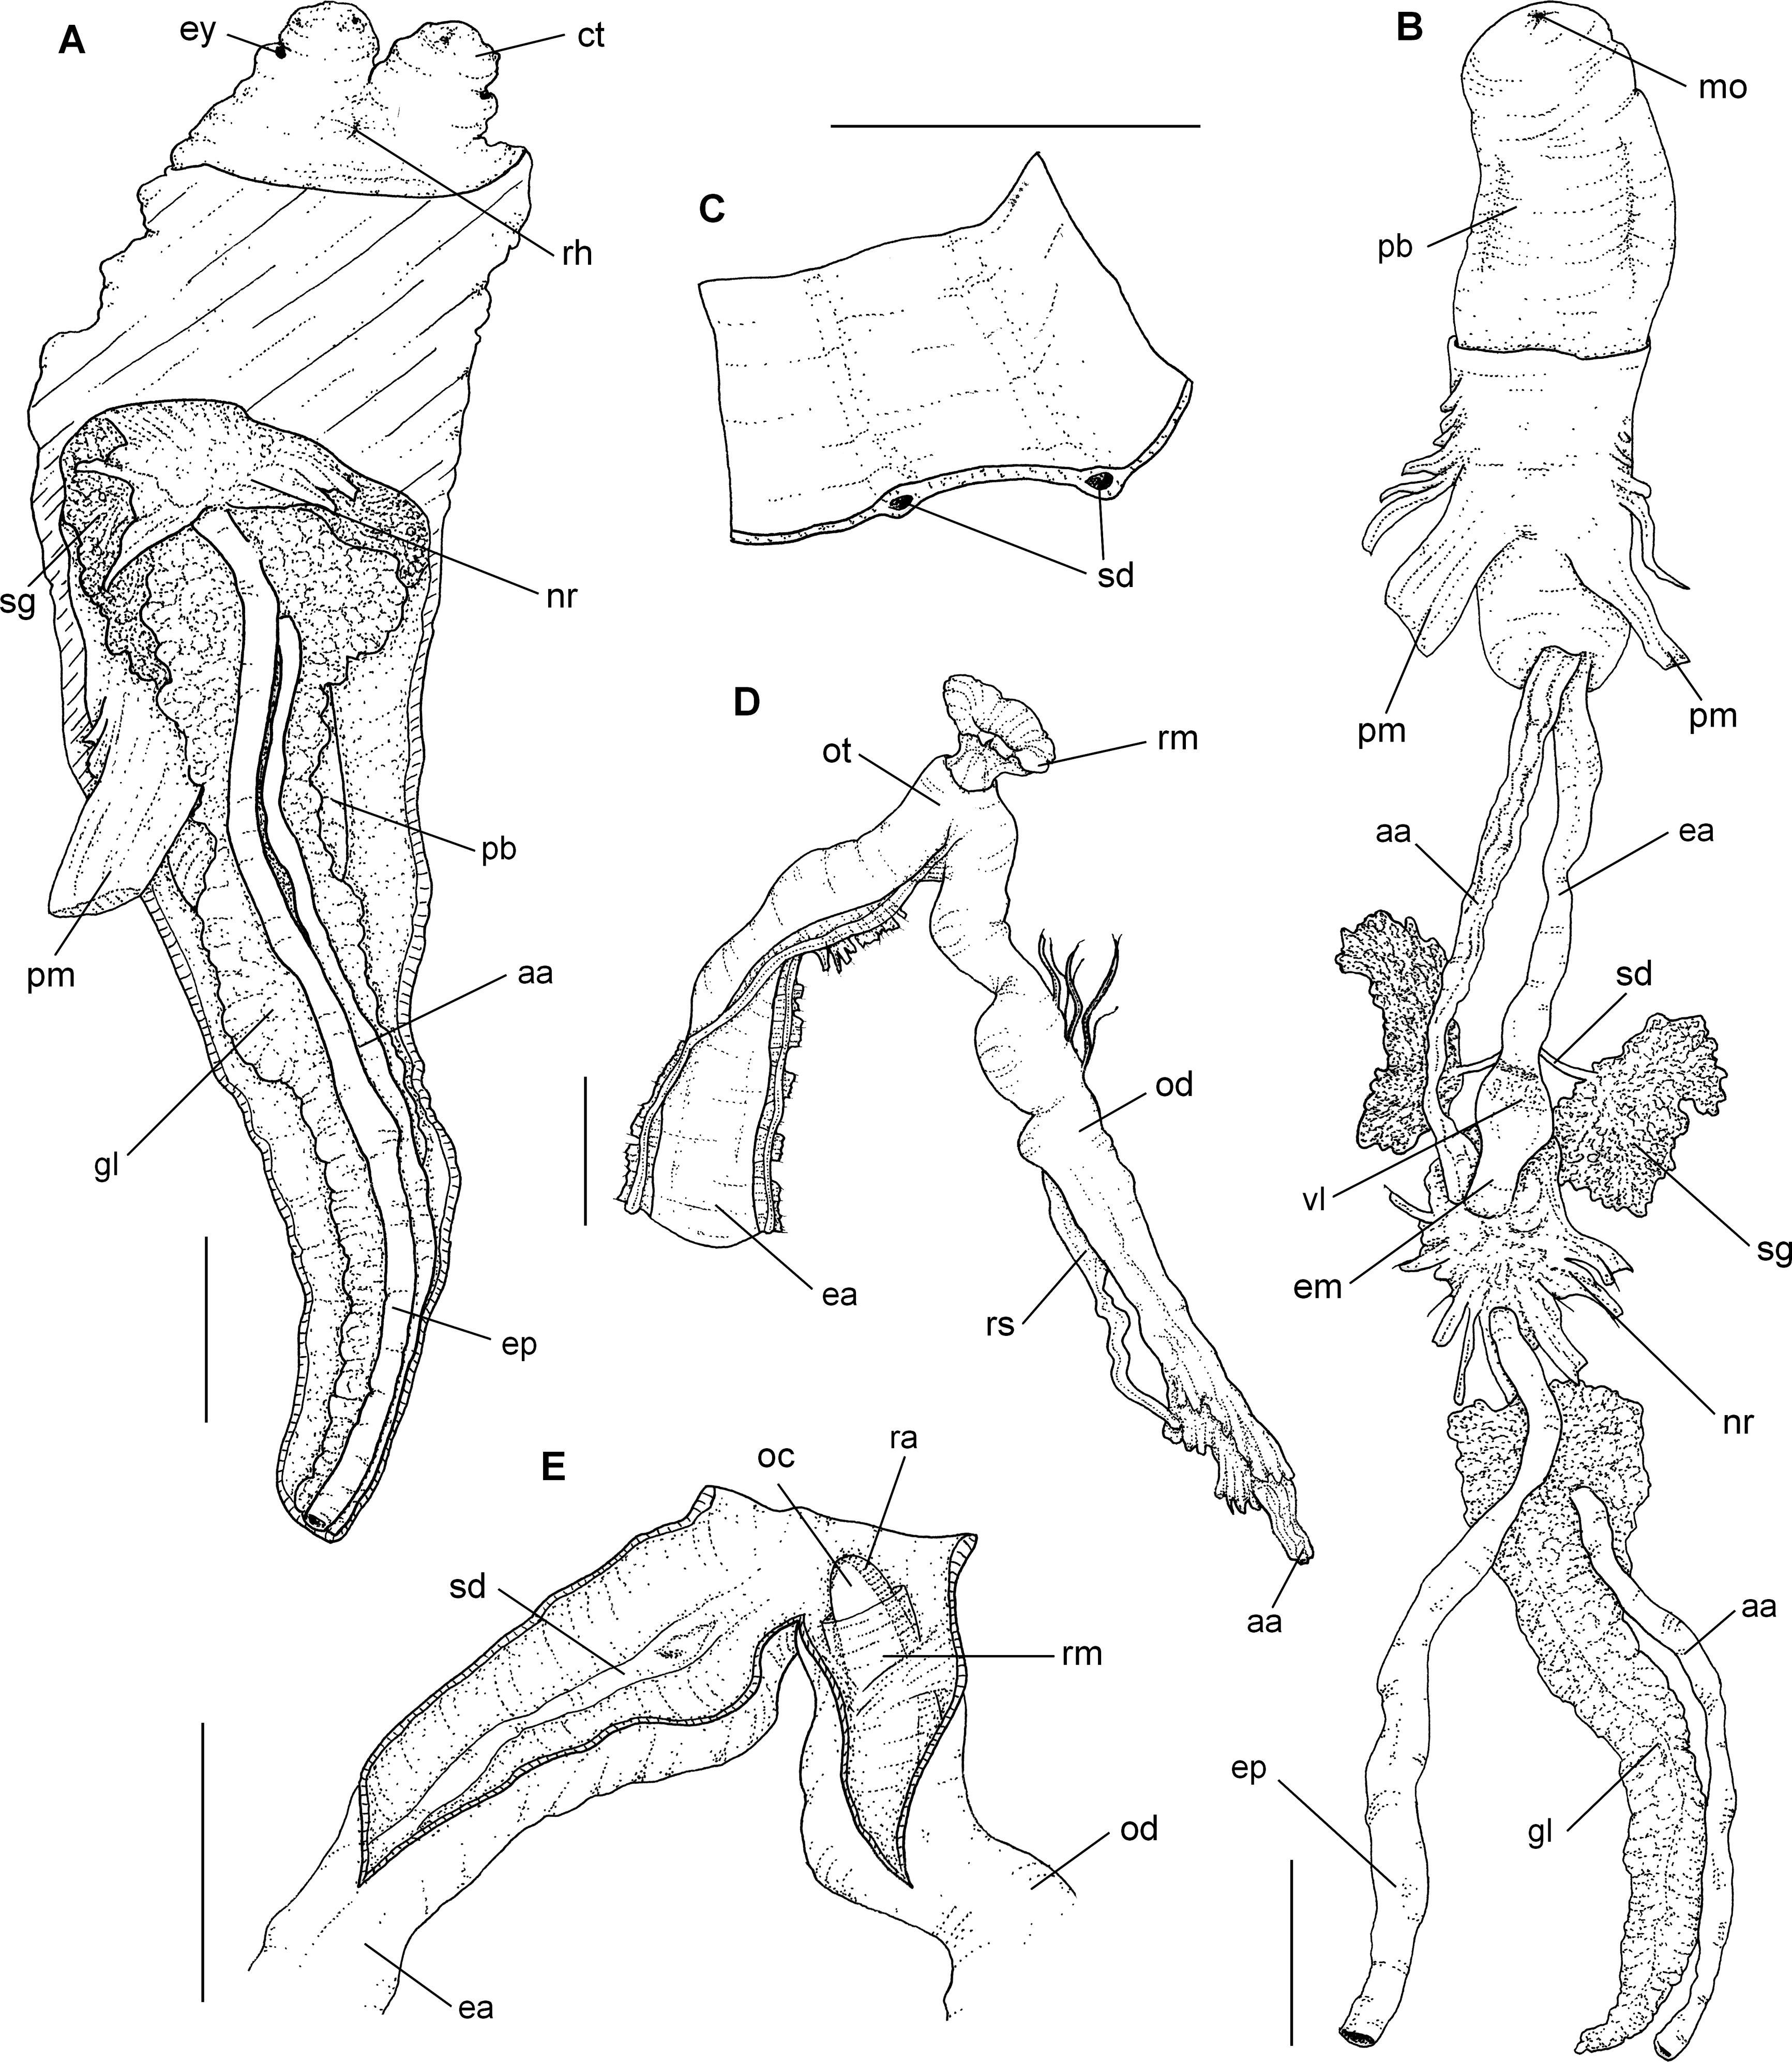 Comparative anatomy of the fasciolariids Pustulatirus ogum and ...